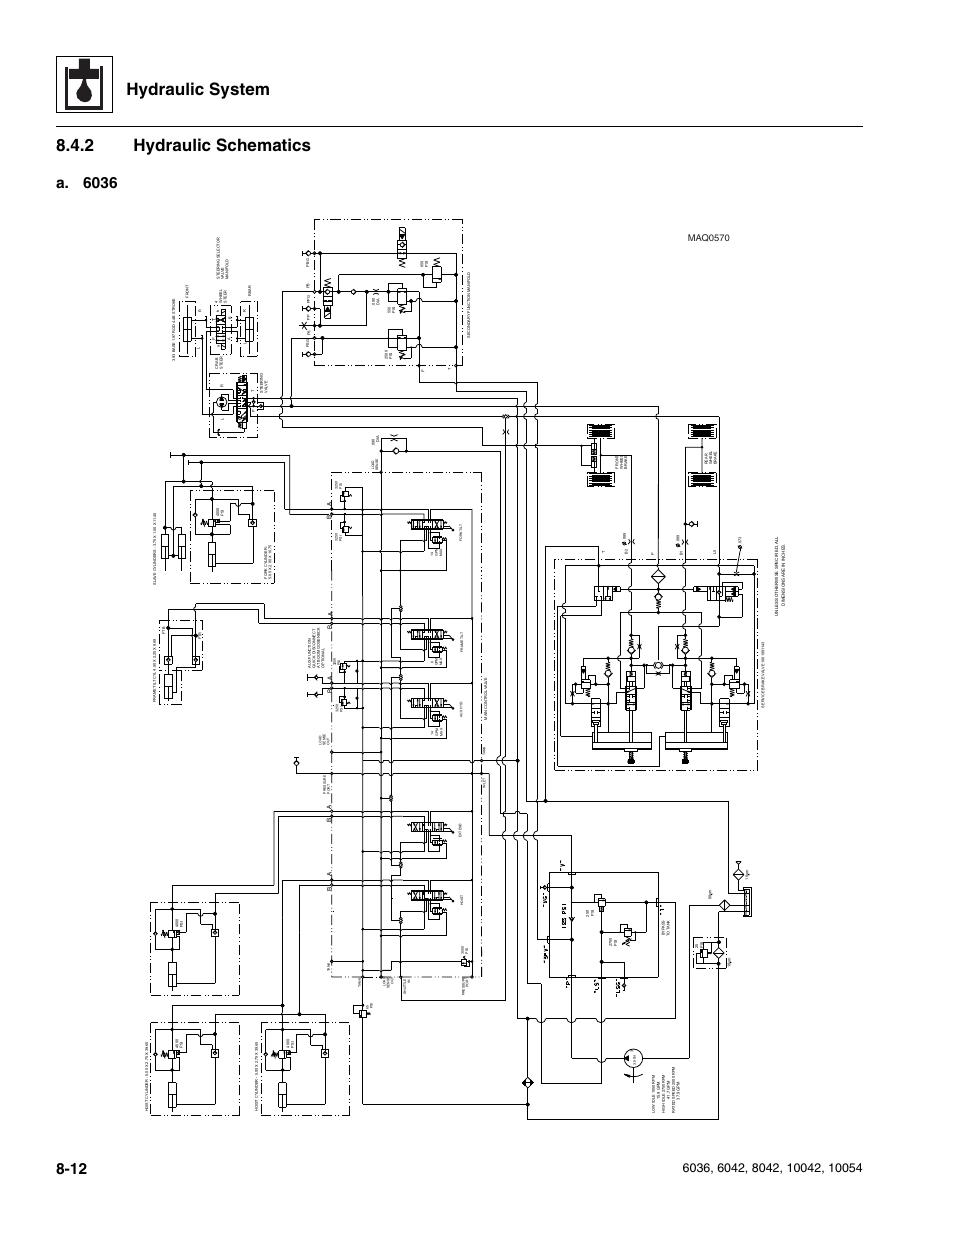 2 hydraulic schematics, Hydraulic schematics, Hydraulic